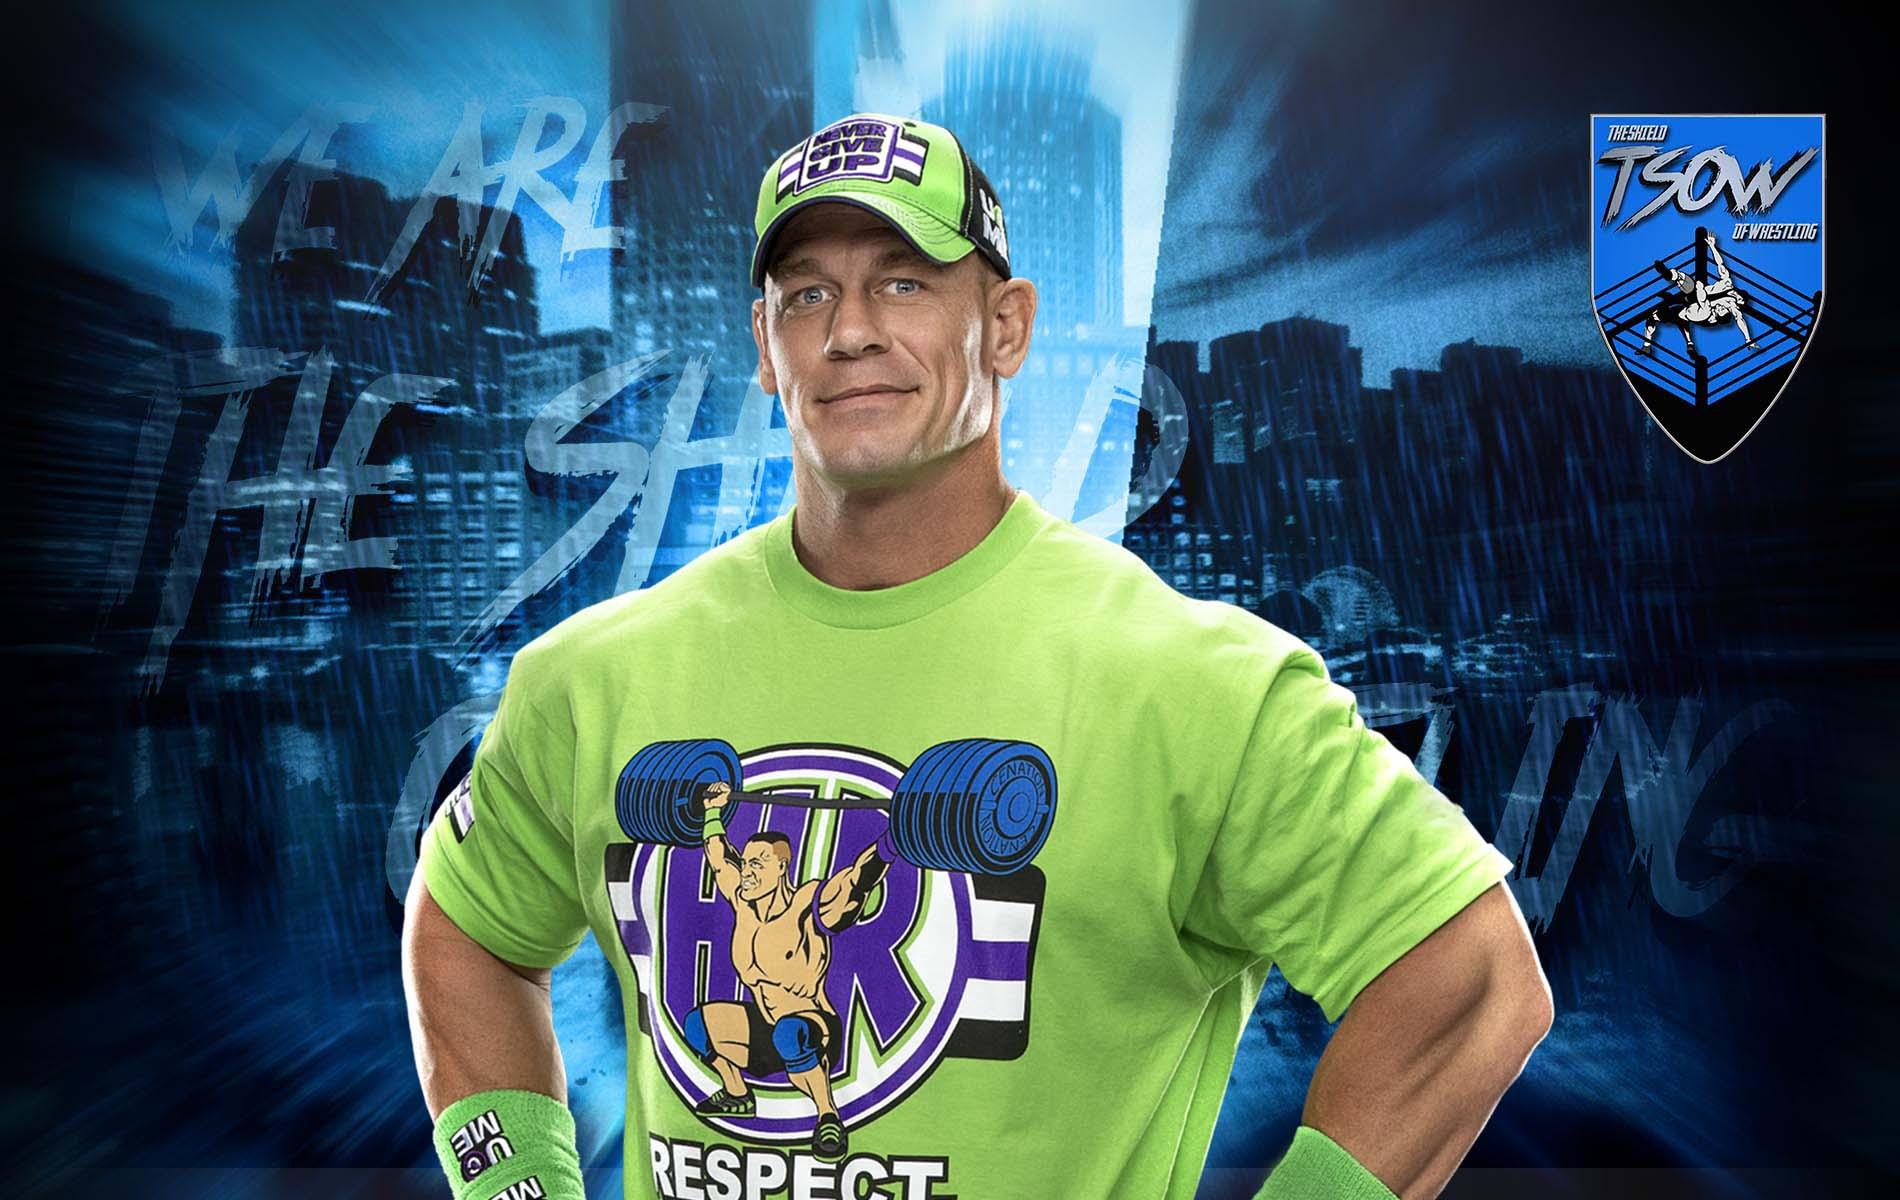 John Cena sarà presente alla Royal Rumble?